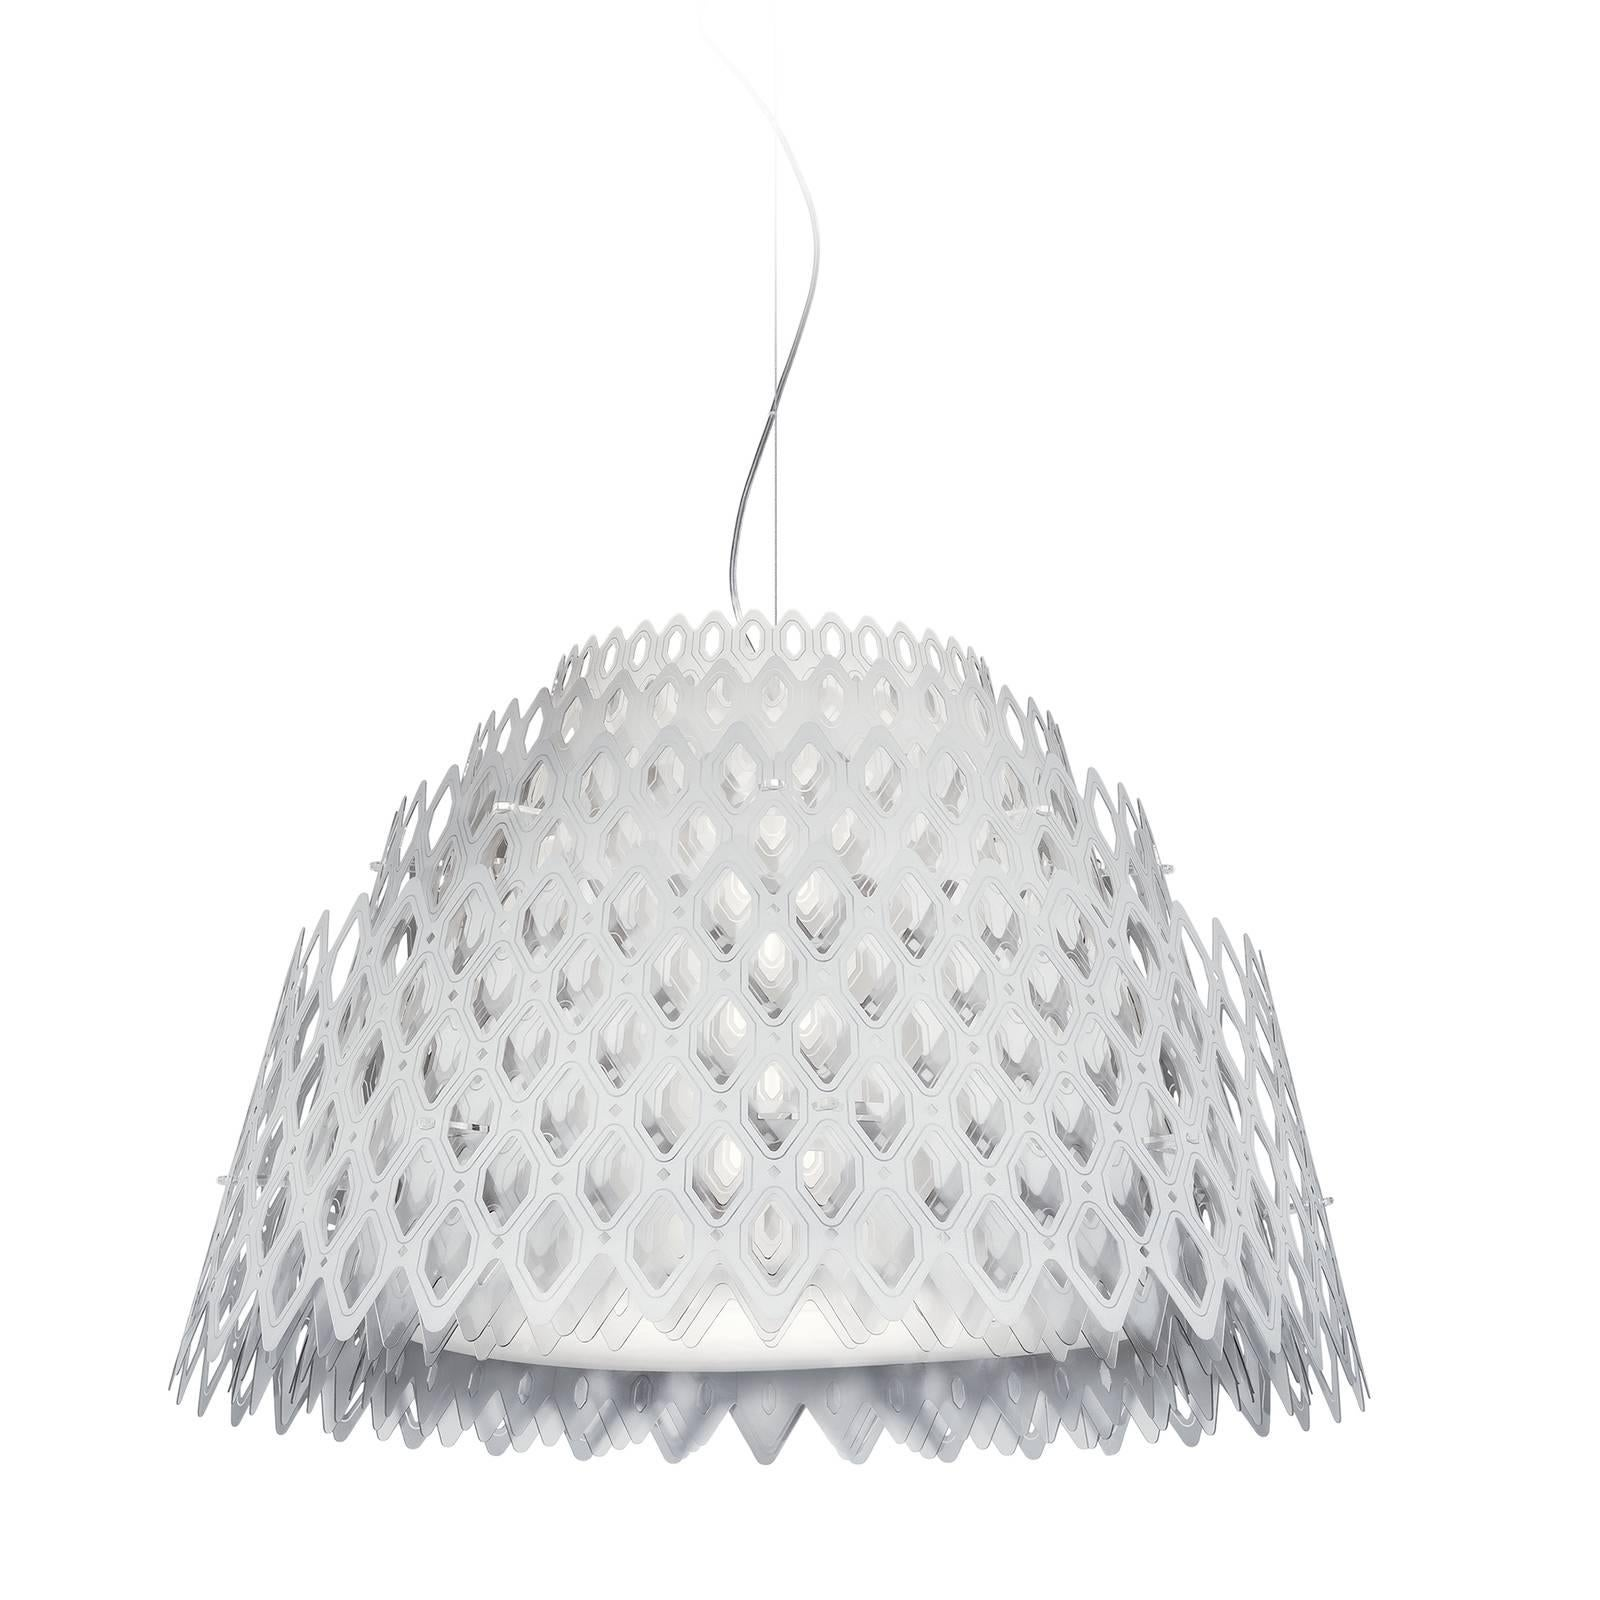 Half Charlotte Ceiling Lamp by Doriana and Massimiliano Fuksas